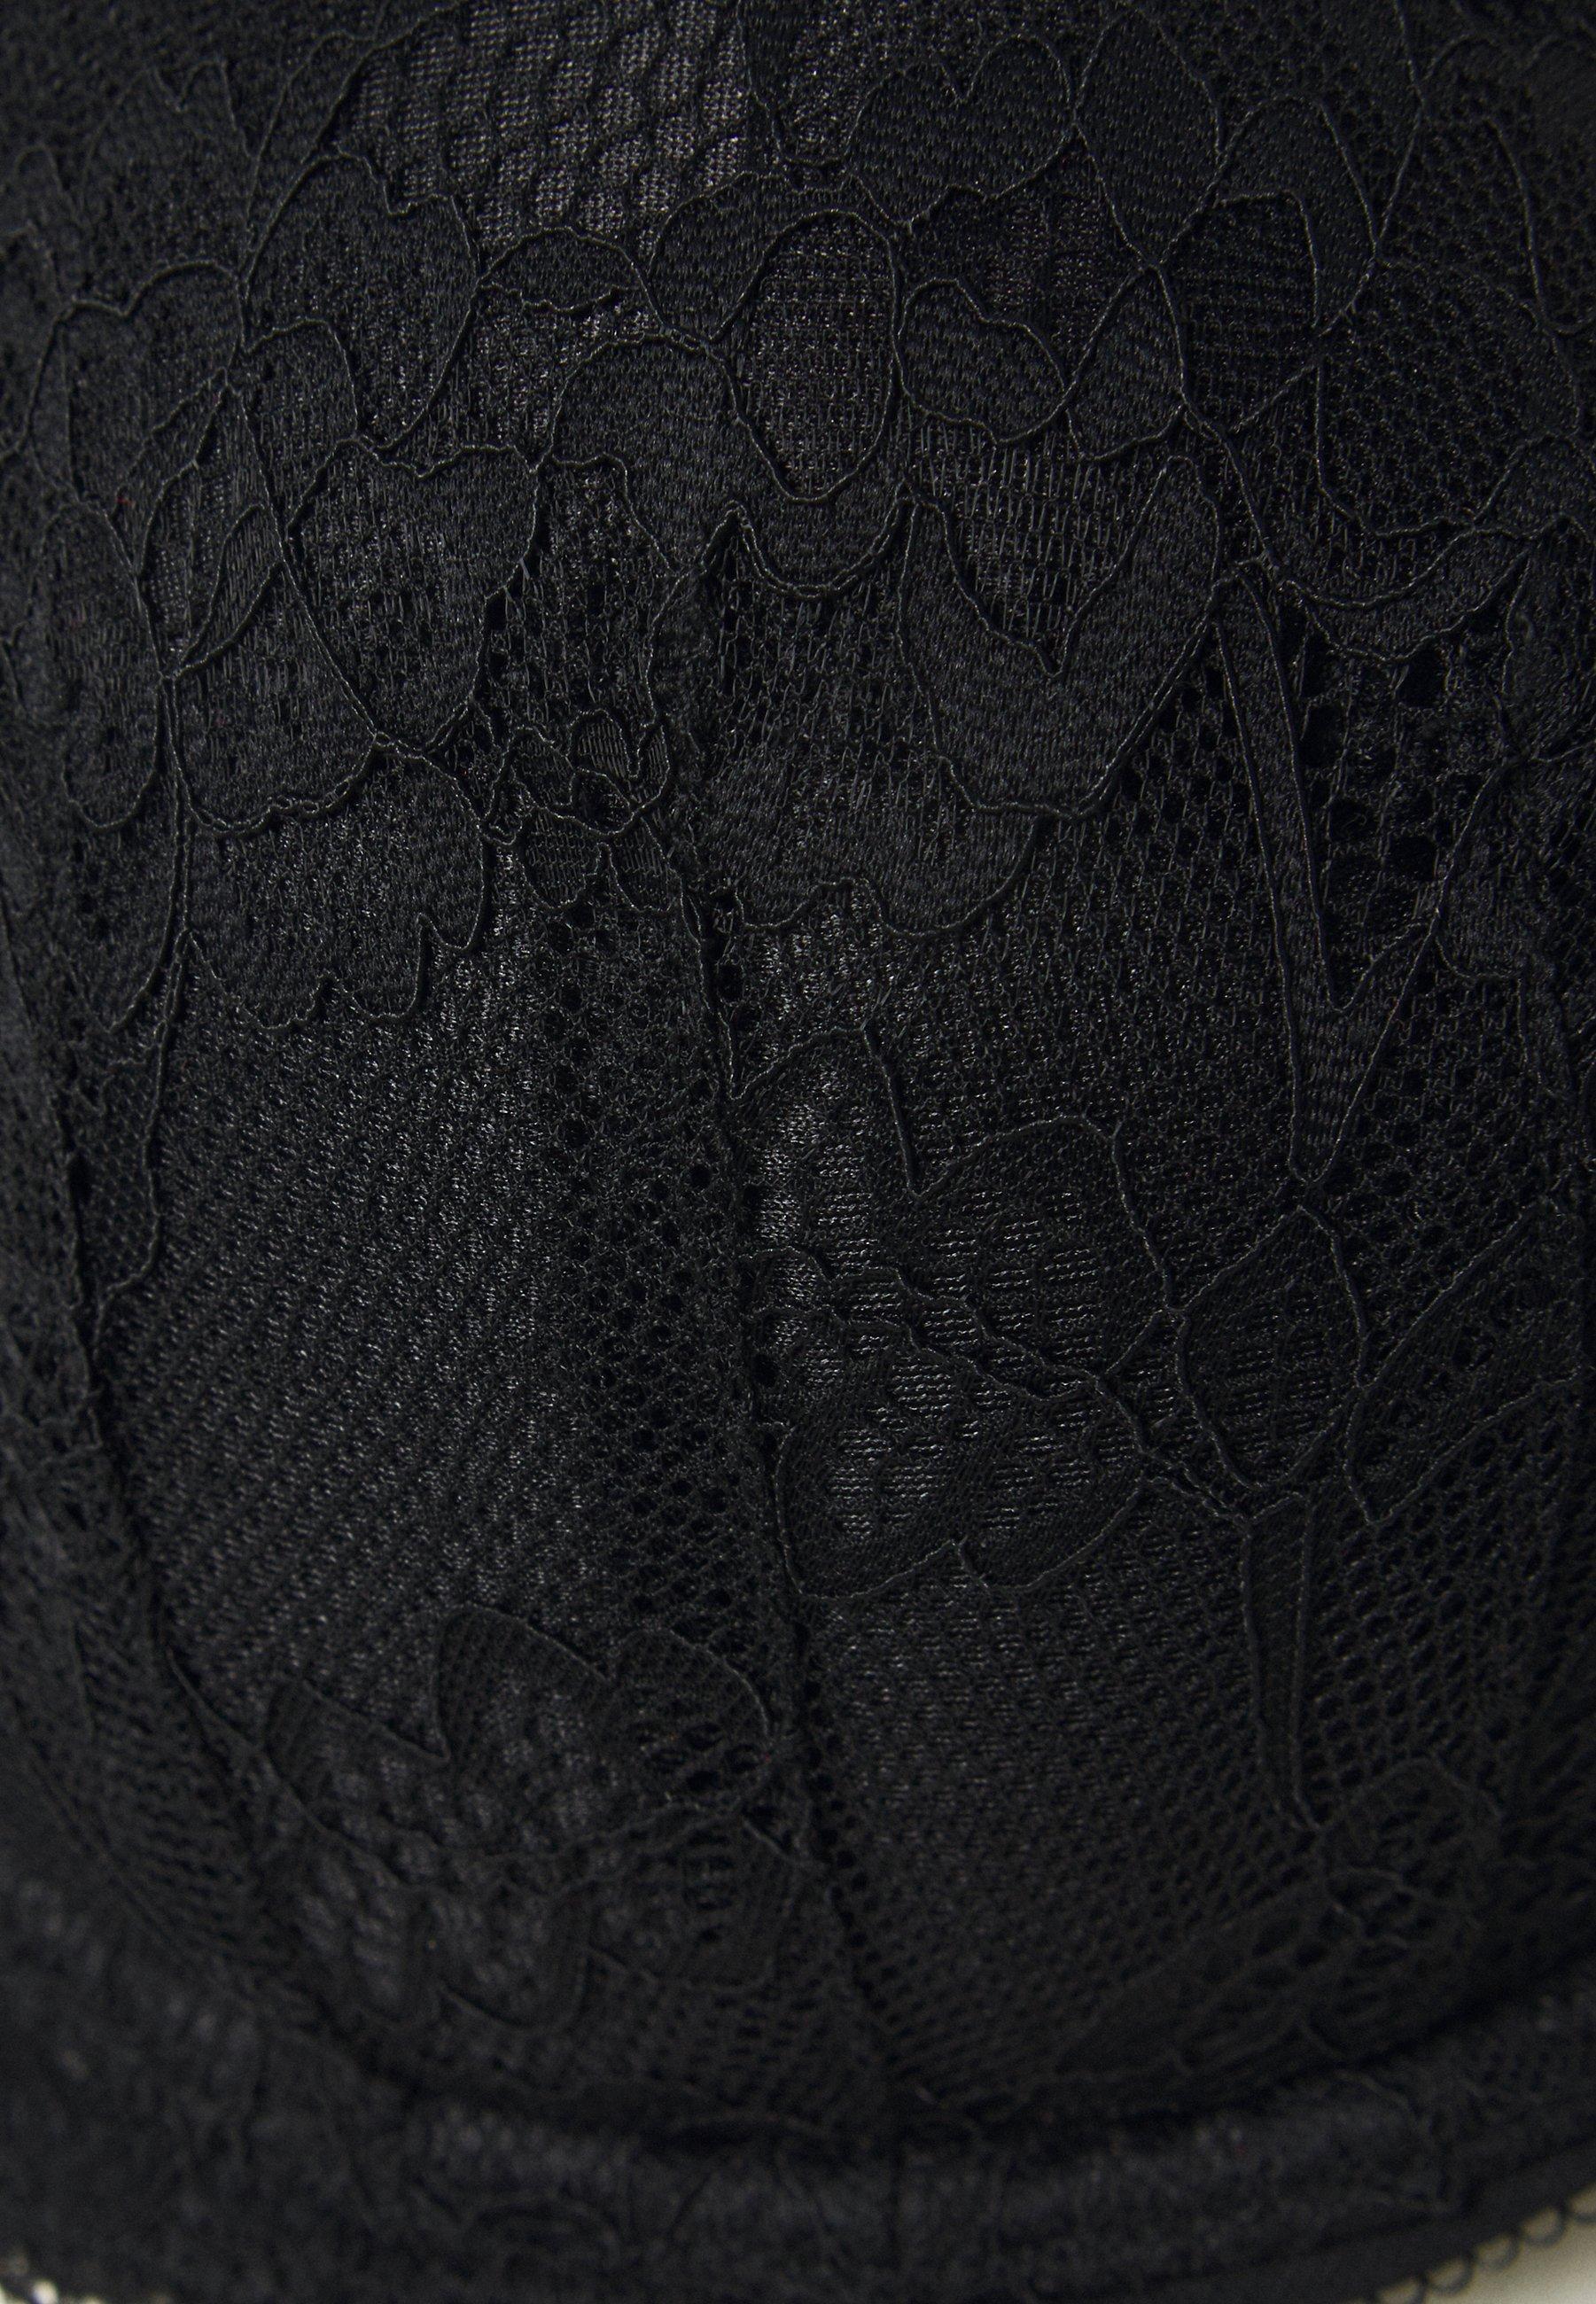 Women SEXY BALCONY - Balconette bra